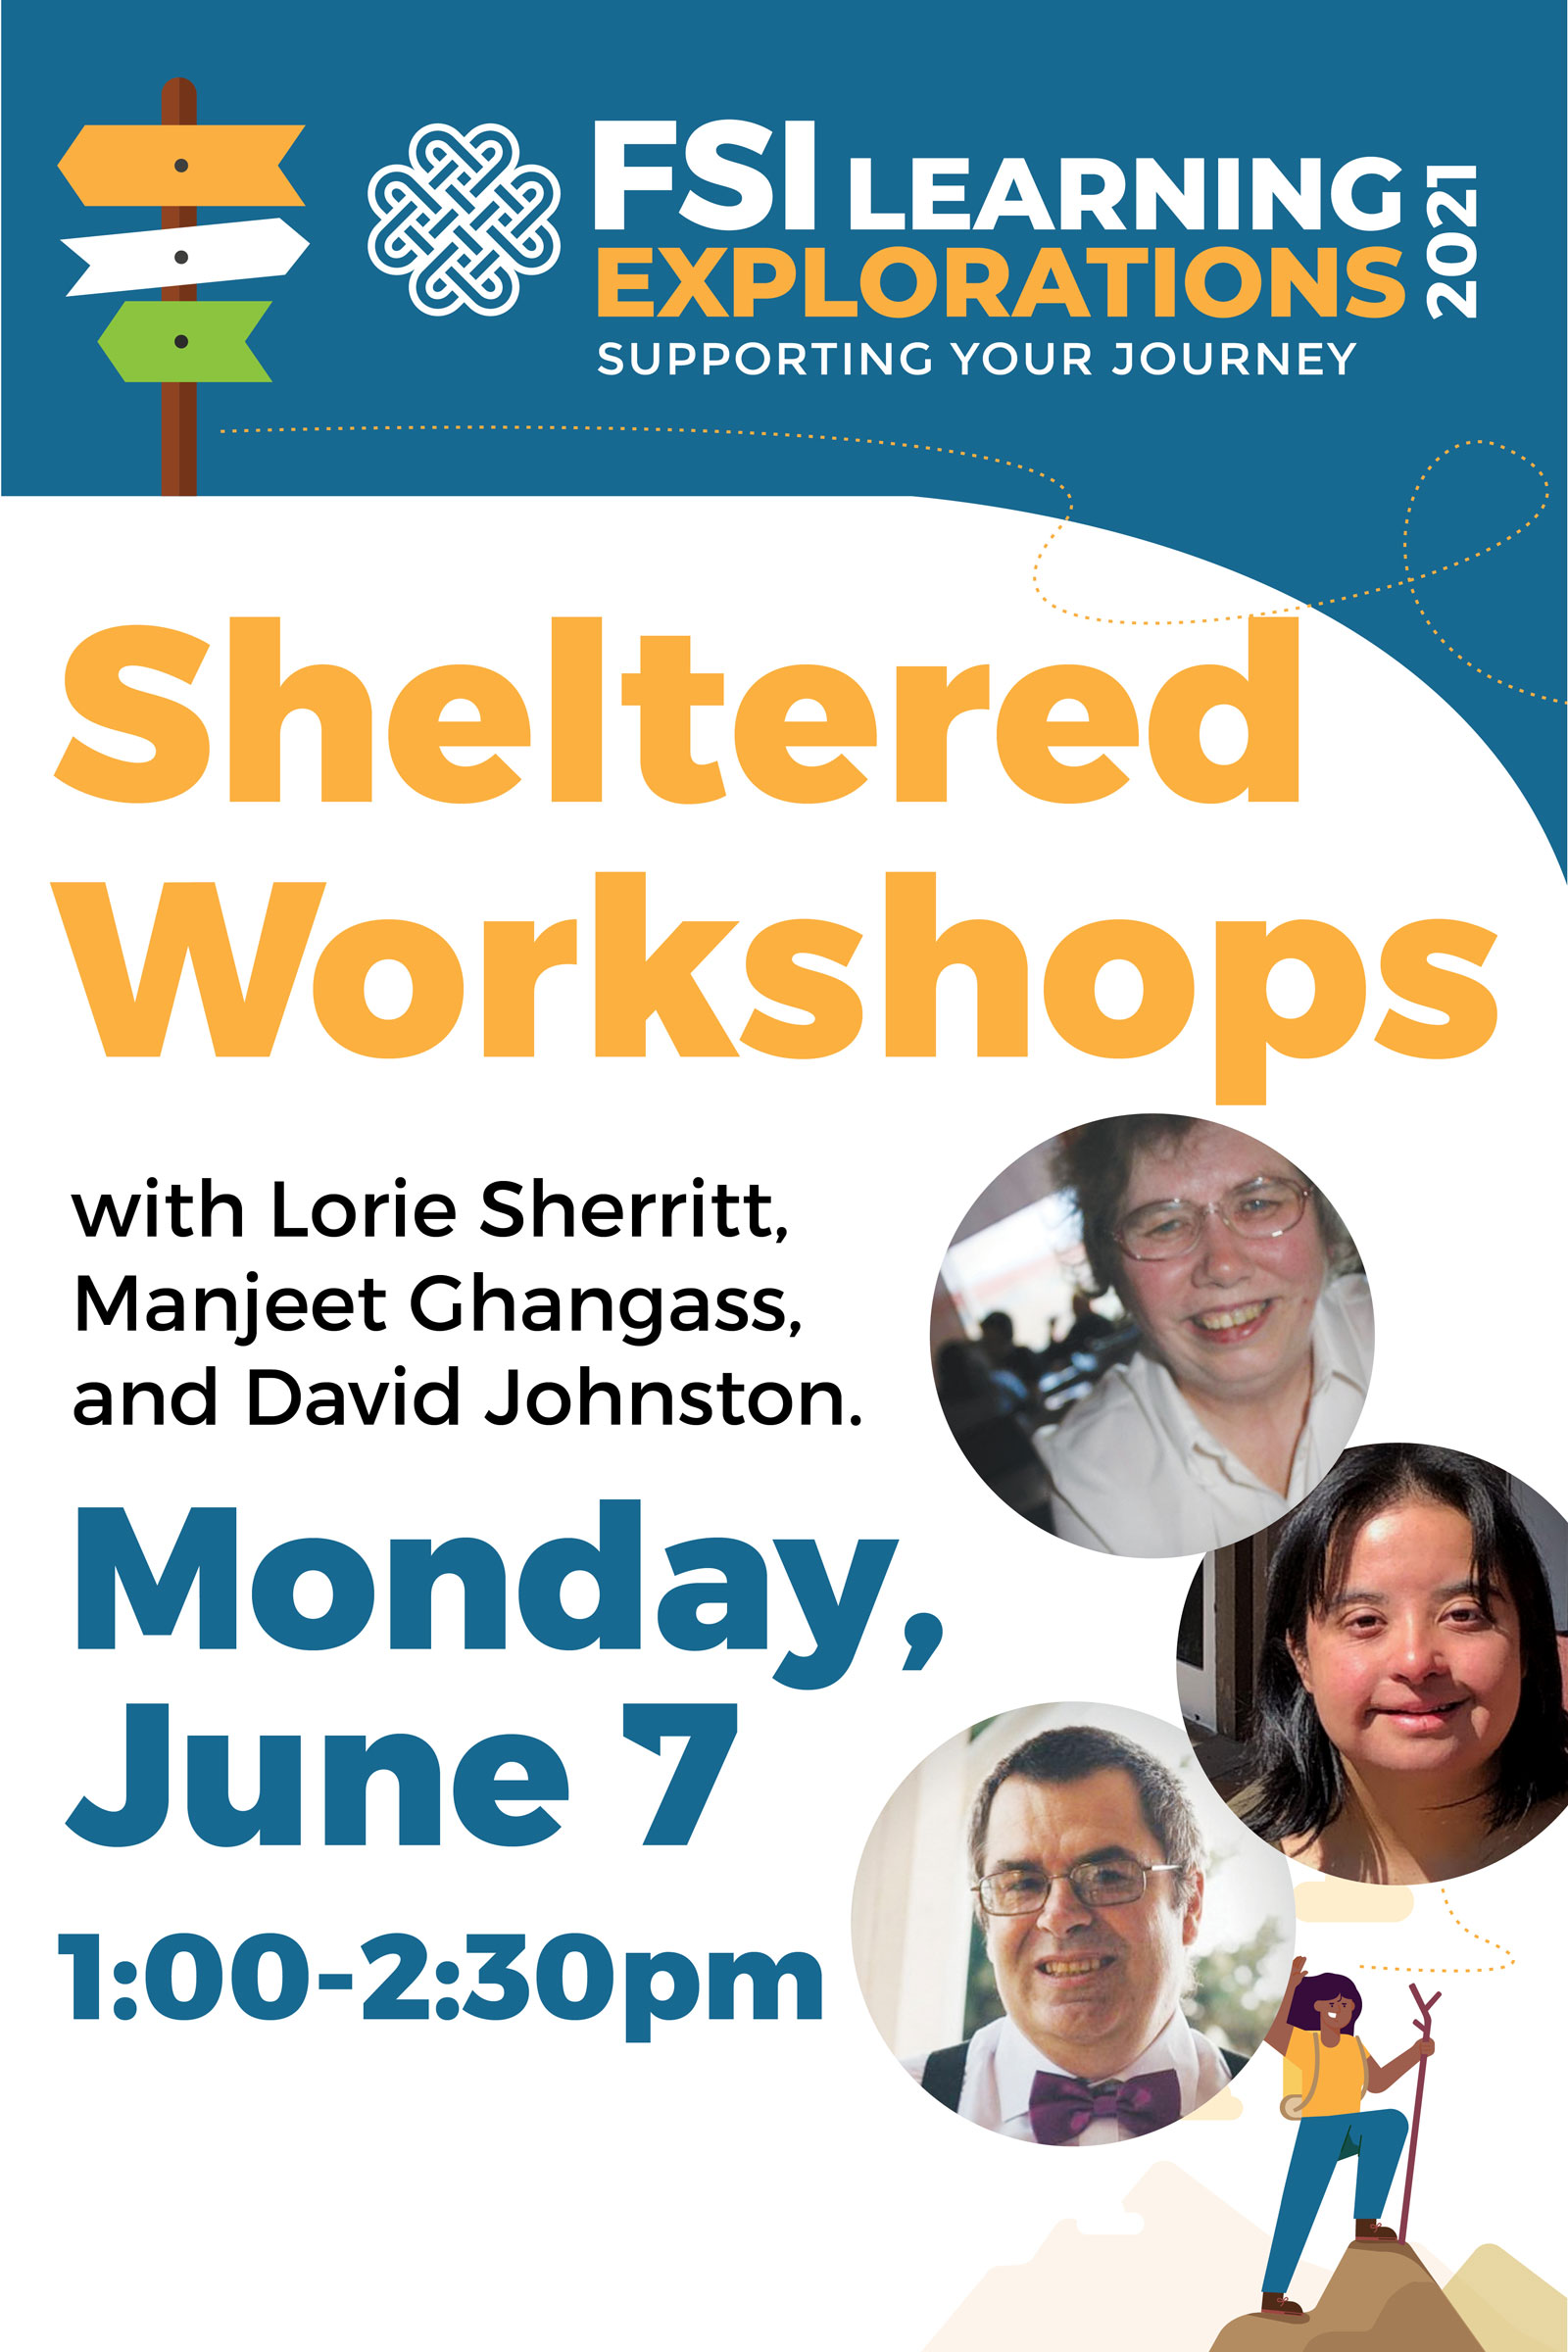 FSI Learning Explorations - Sheltered Workshops